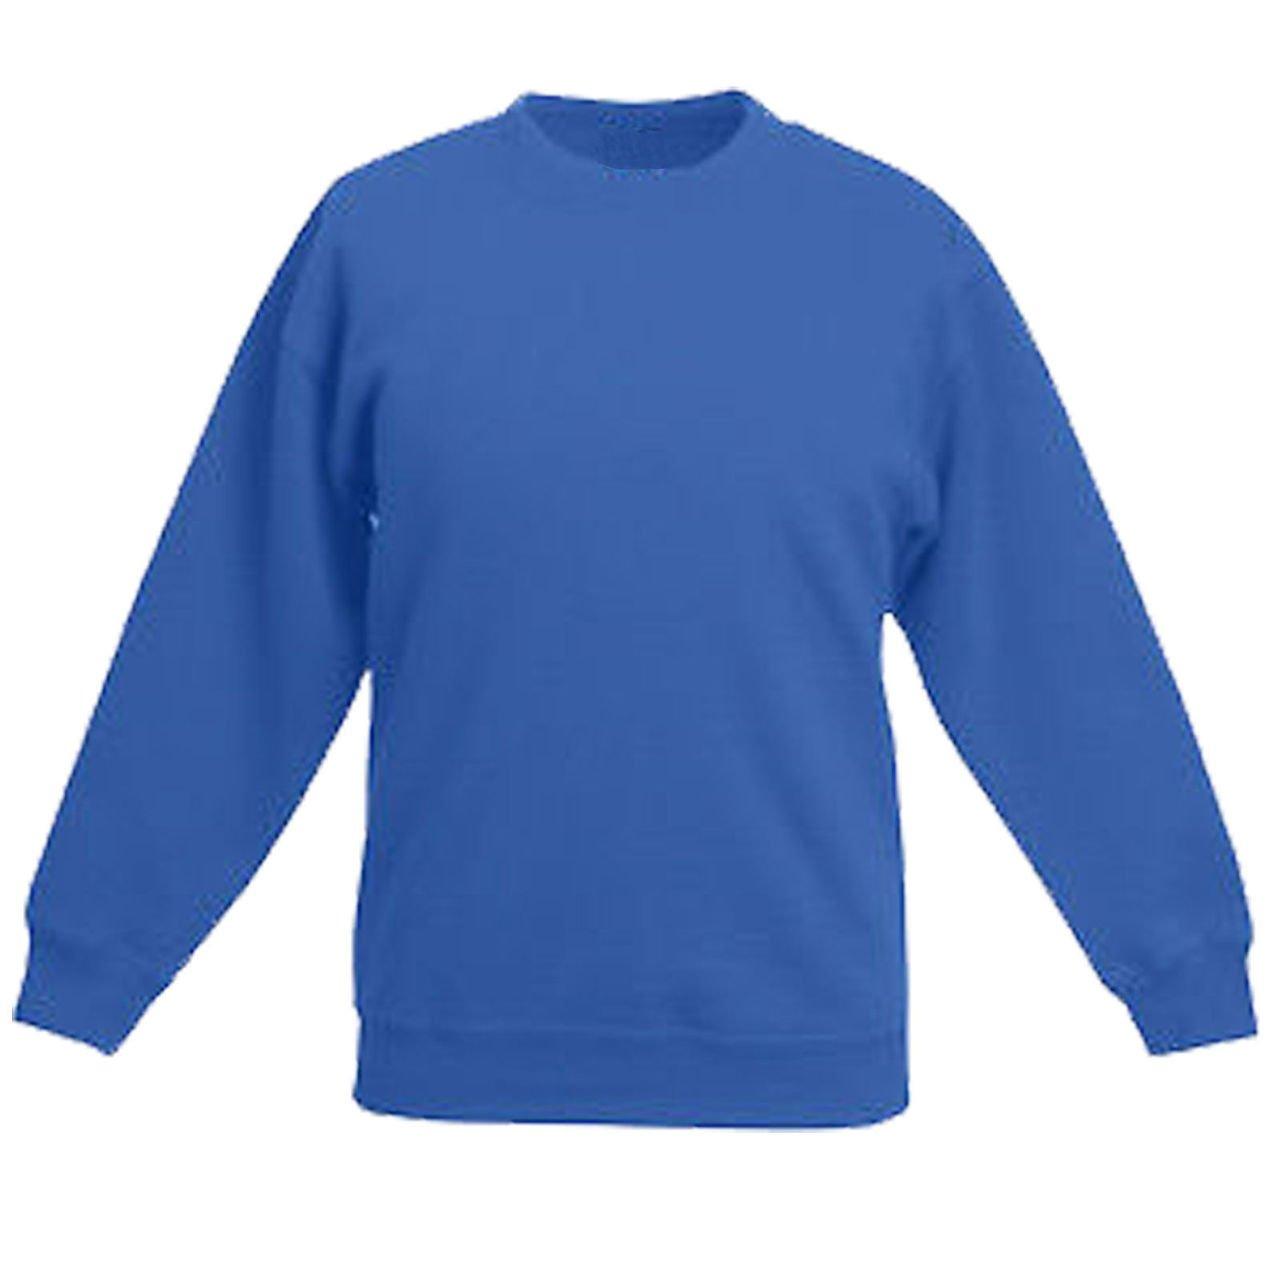 School Uniform Sweatshirt Pullover Fleece Jumper Plain: Amazon.co ...